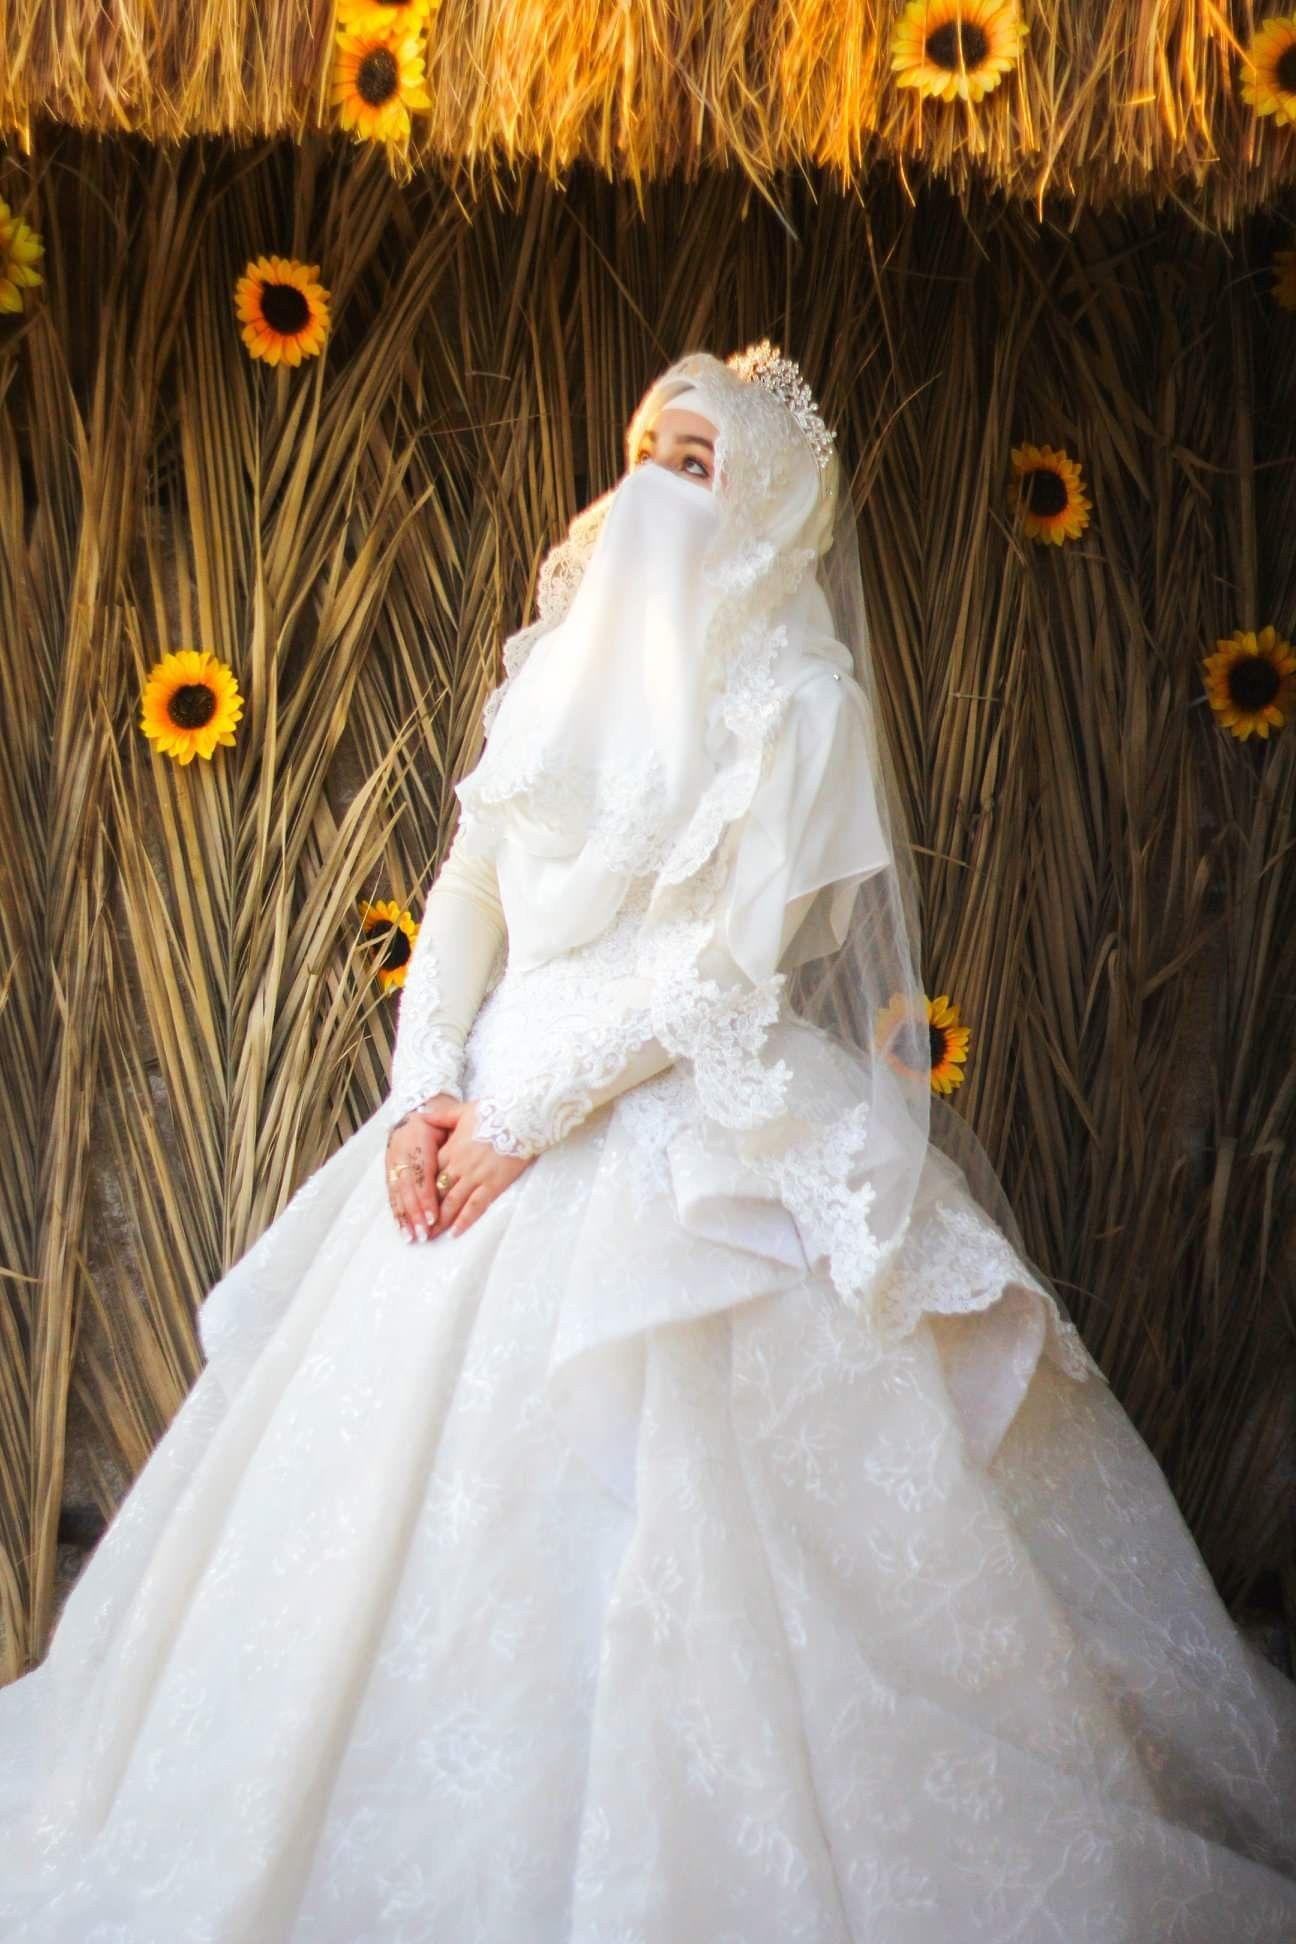 Pin Oleh Alexa June Di Marriage Pengantin Gaun Pengantin Pernikahan